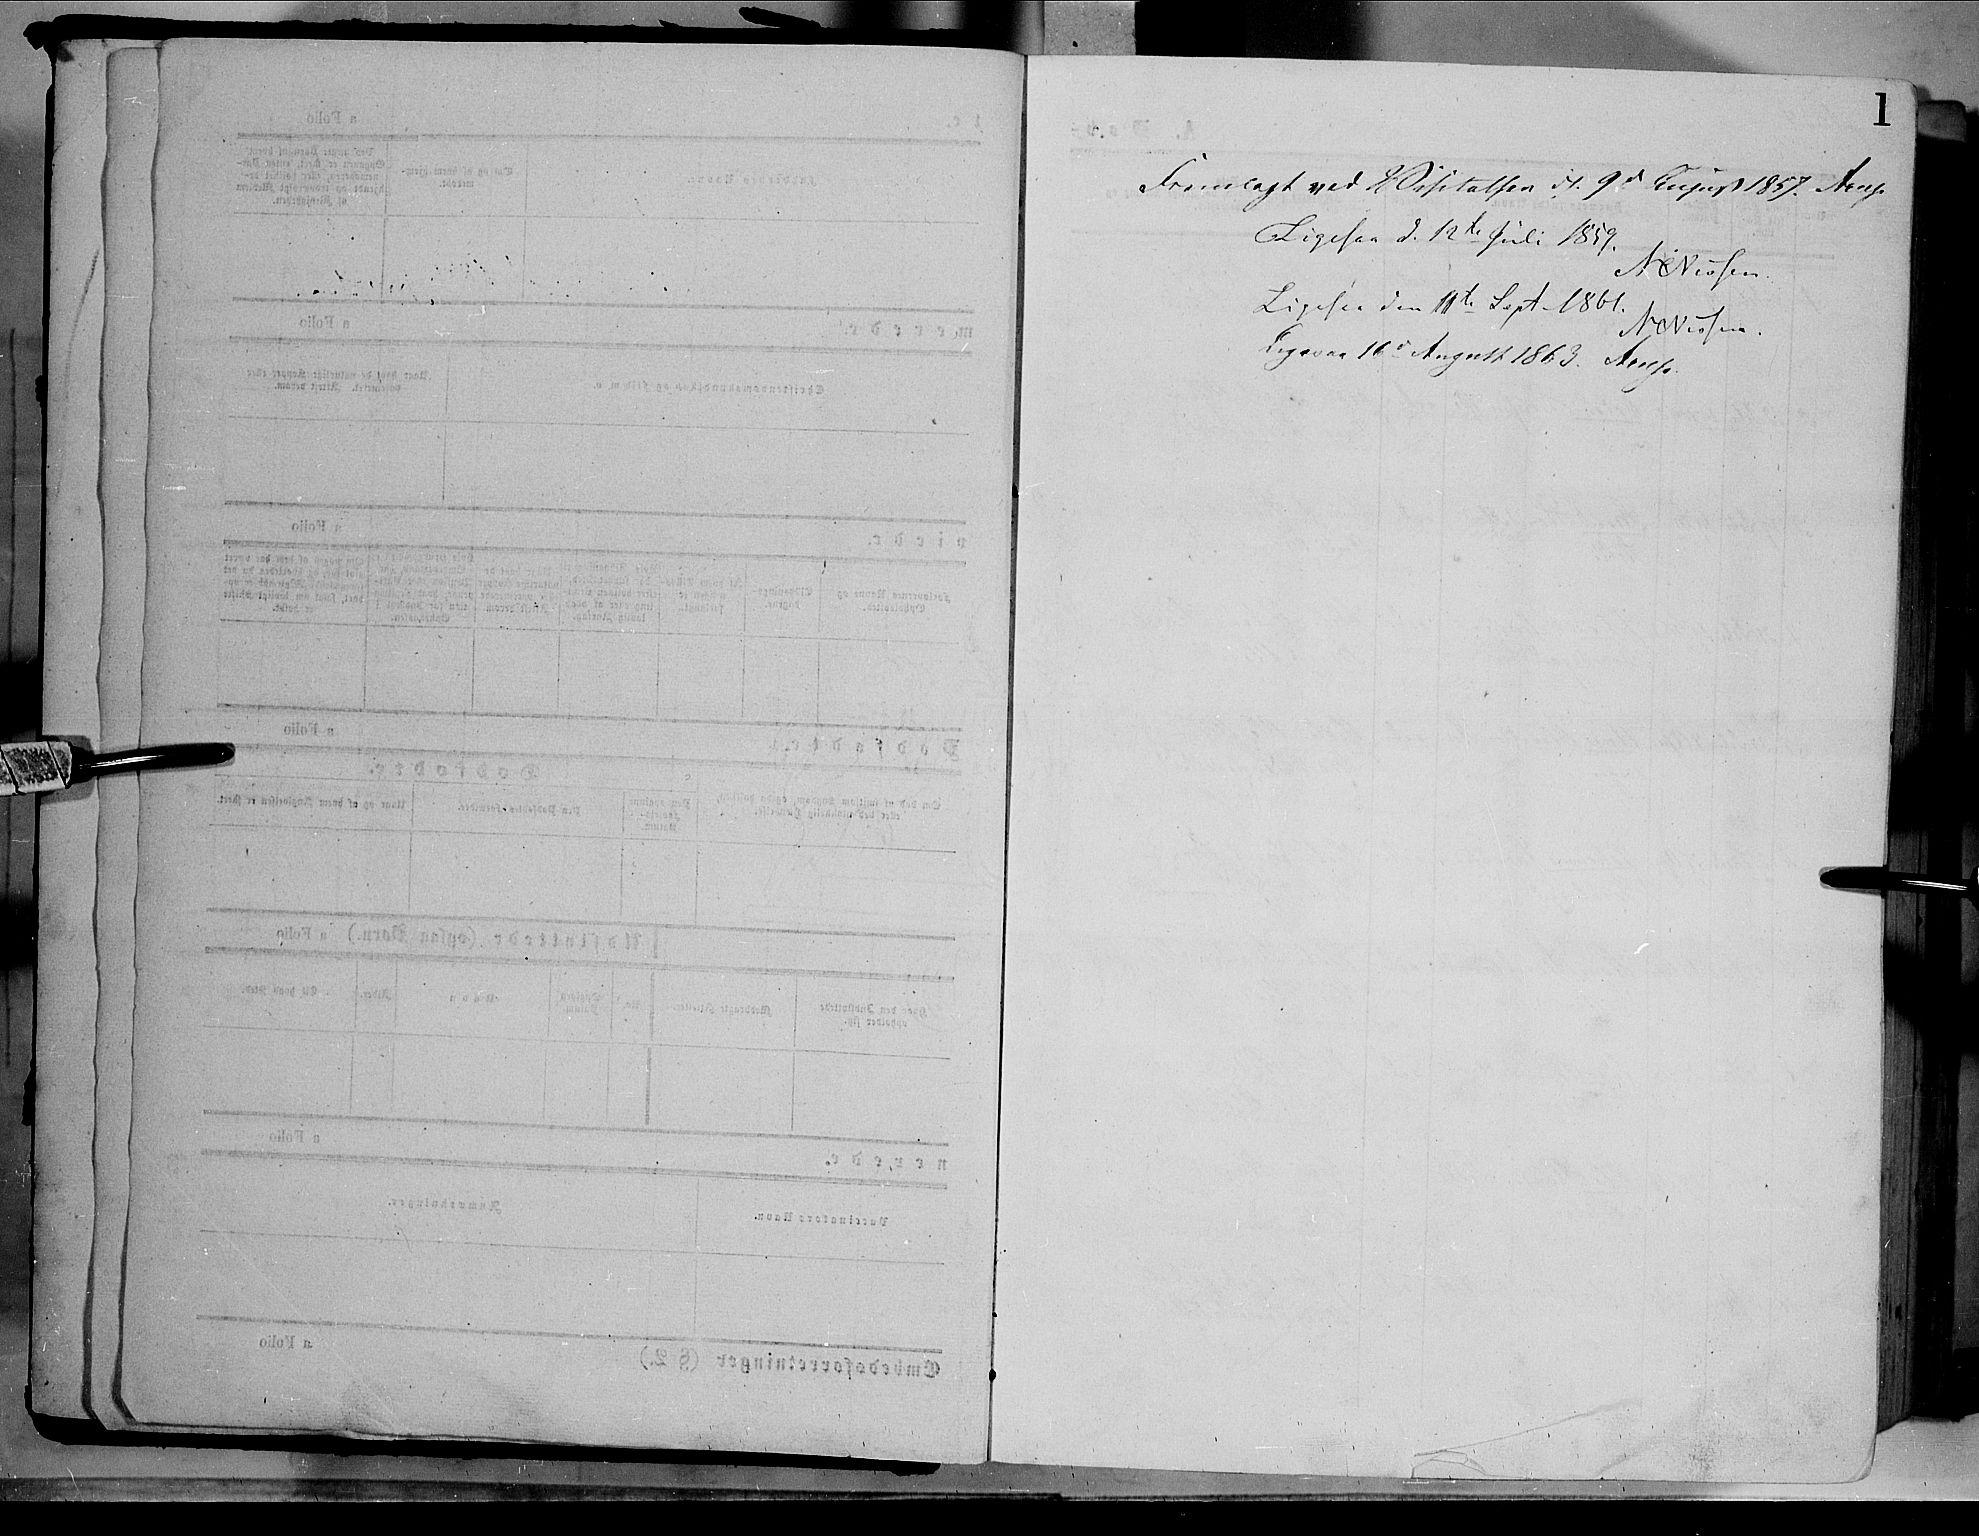 SAH, Dovre prestekontor, Ministerialbok nr. 1, 1854-1878, s. 1